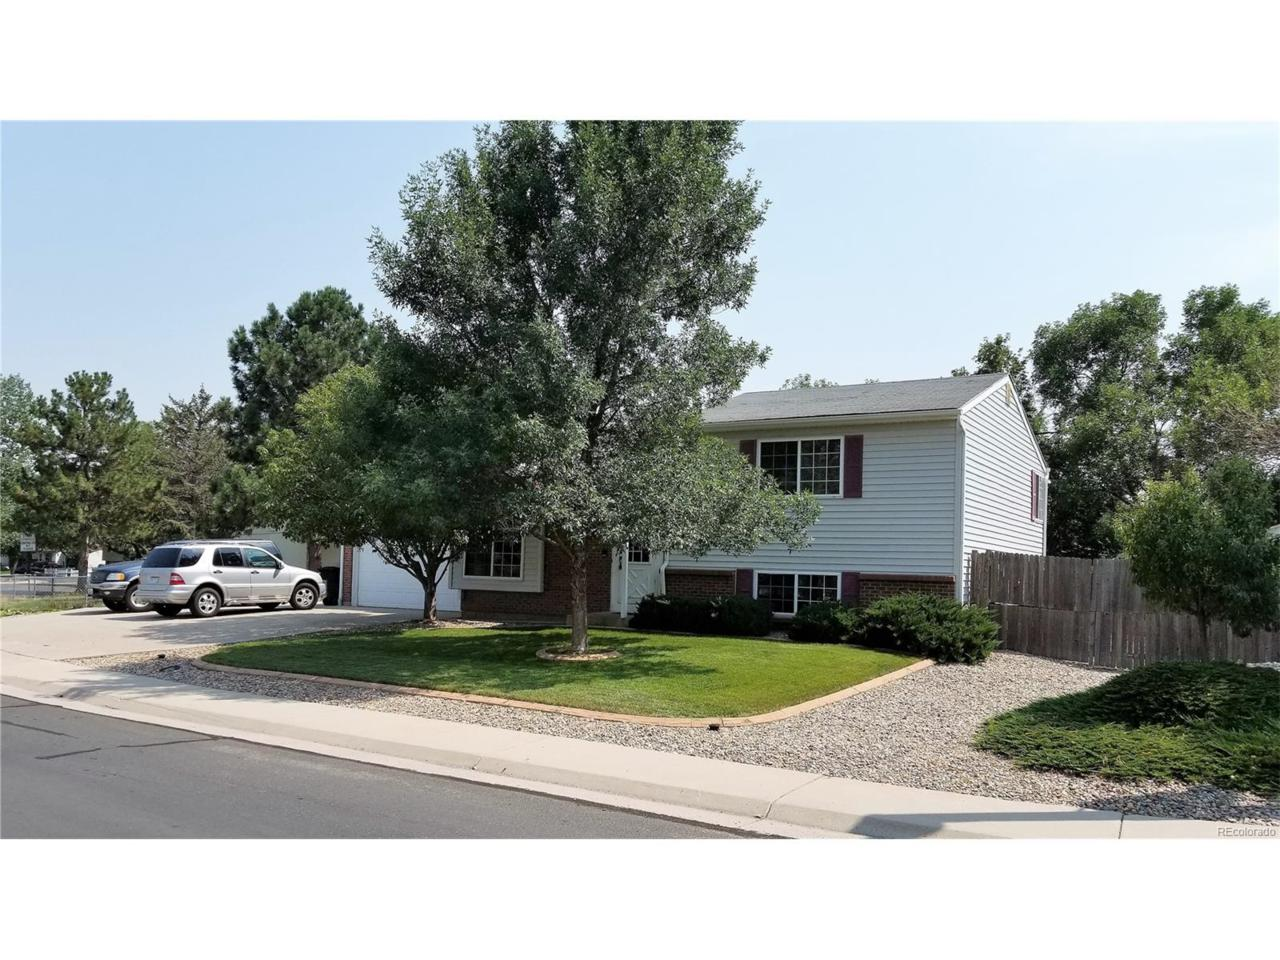 4000 Woodglen Boulevard, Thornton, CO 80233 (MLS #5262565) :: 8z Real Estate